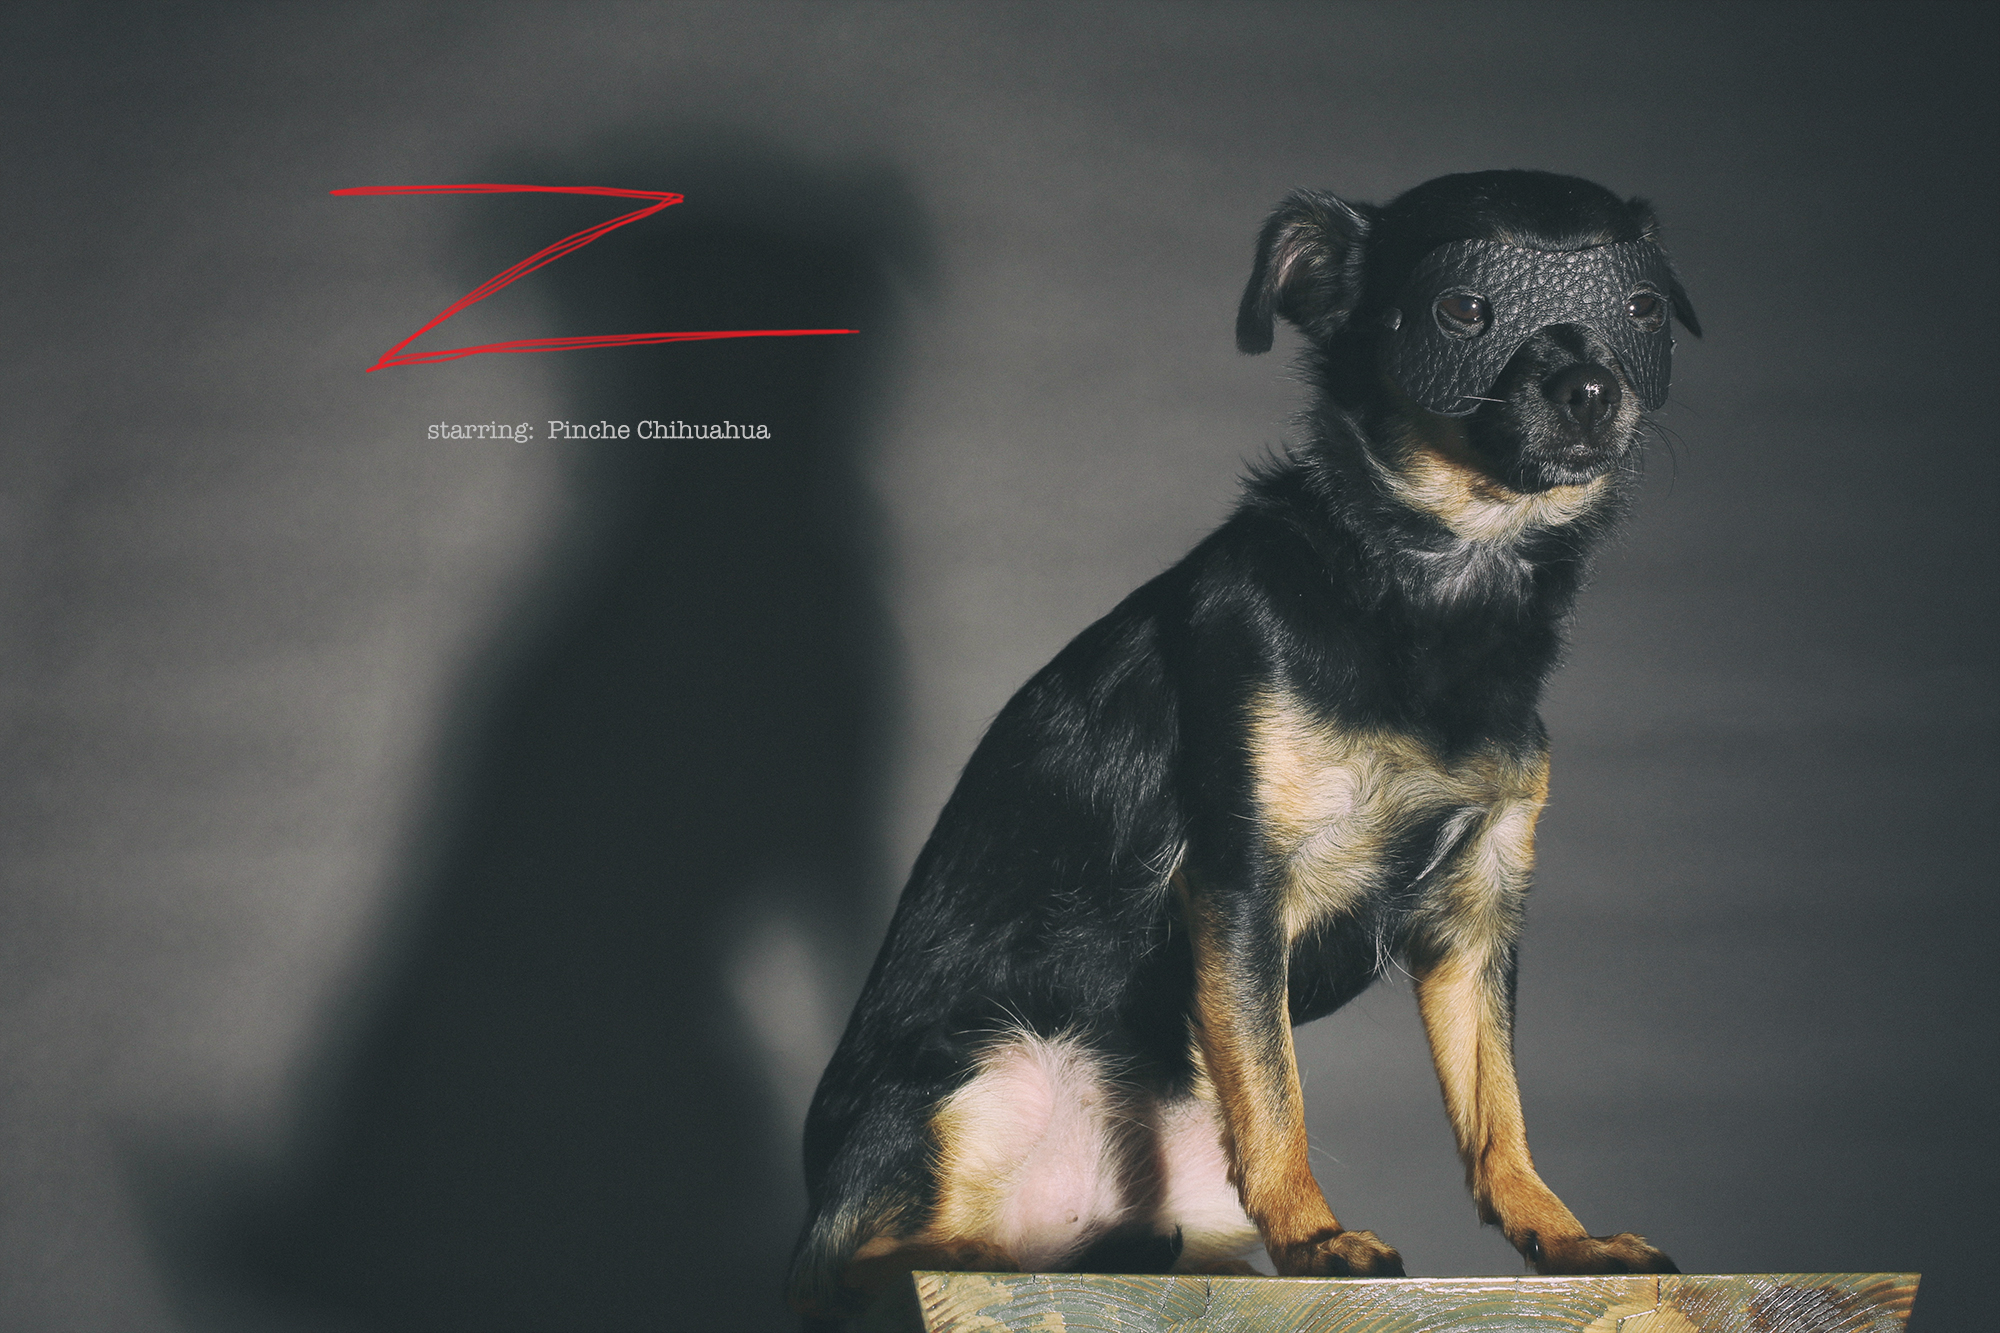 chihuahua1.jpg